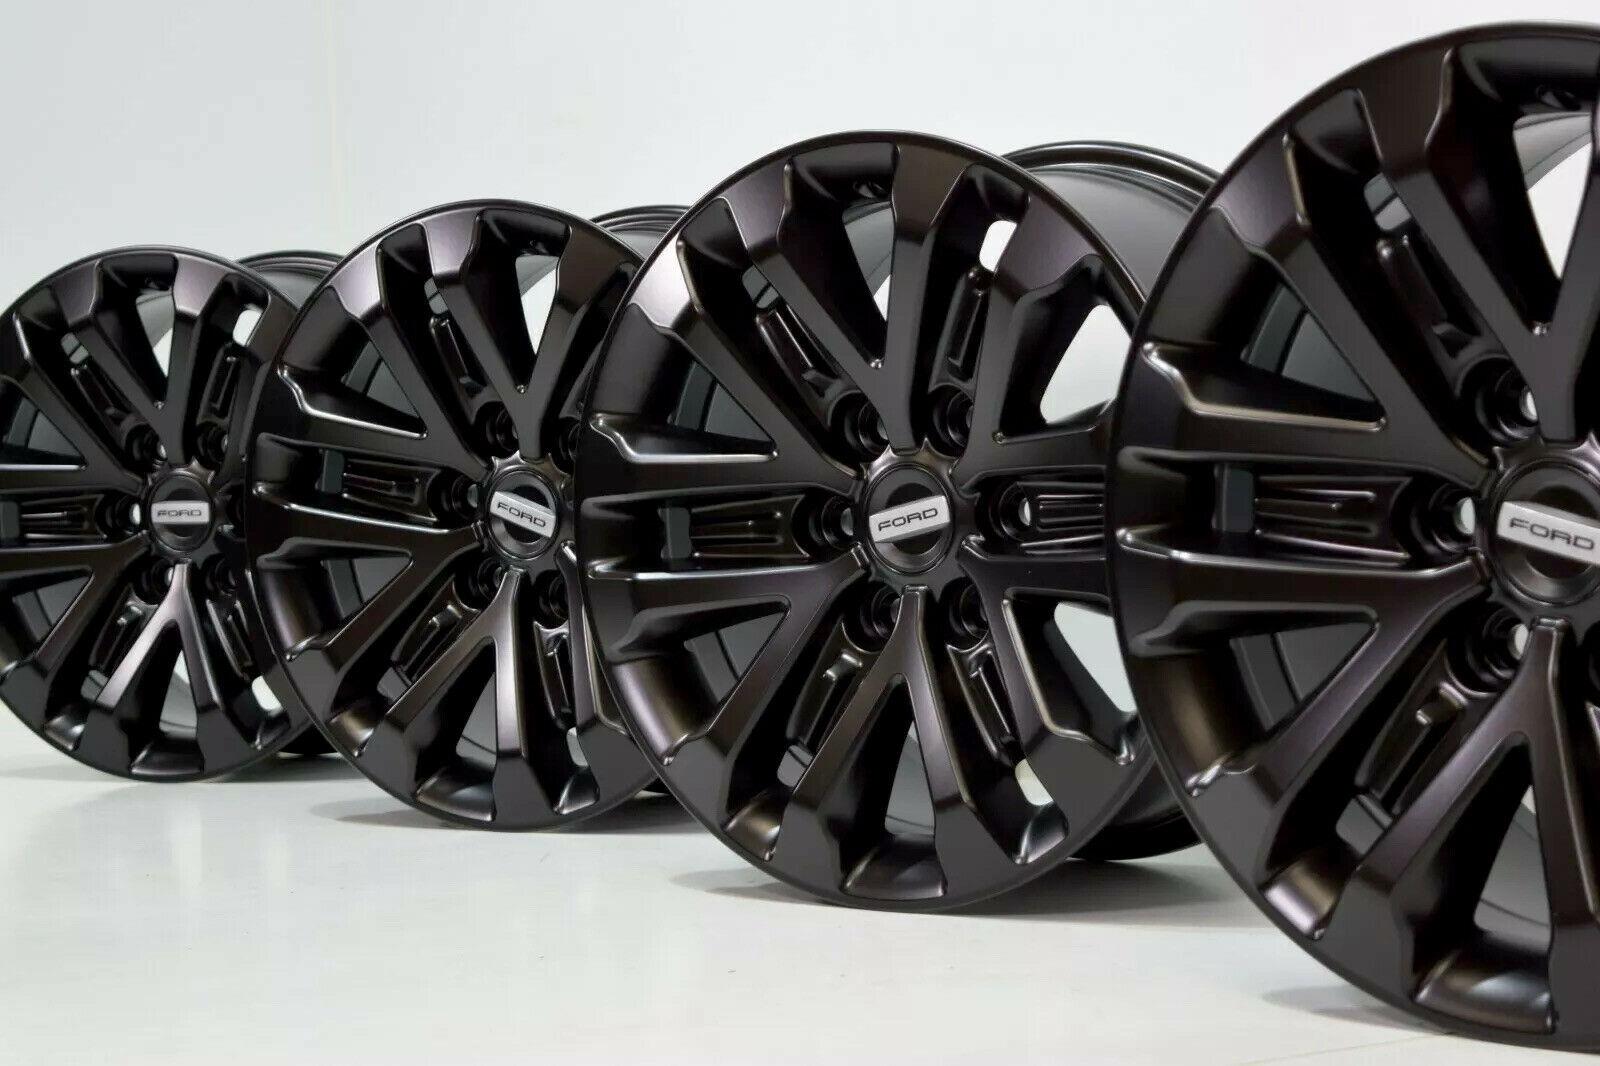 Black 2019 Ford Raptor F150 Oem Factory 17 Wheels Rims 6x135 Kl3v 1007 Aa Factory Wheel Republic